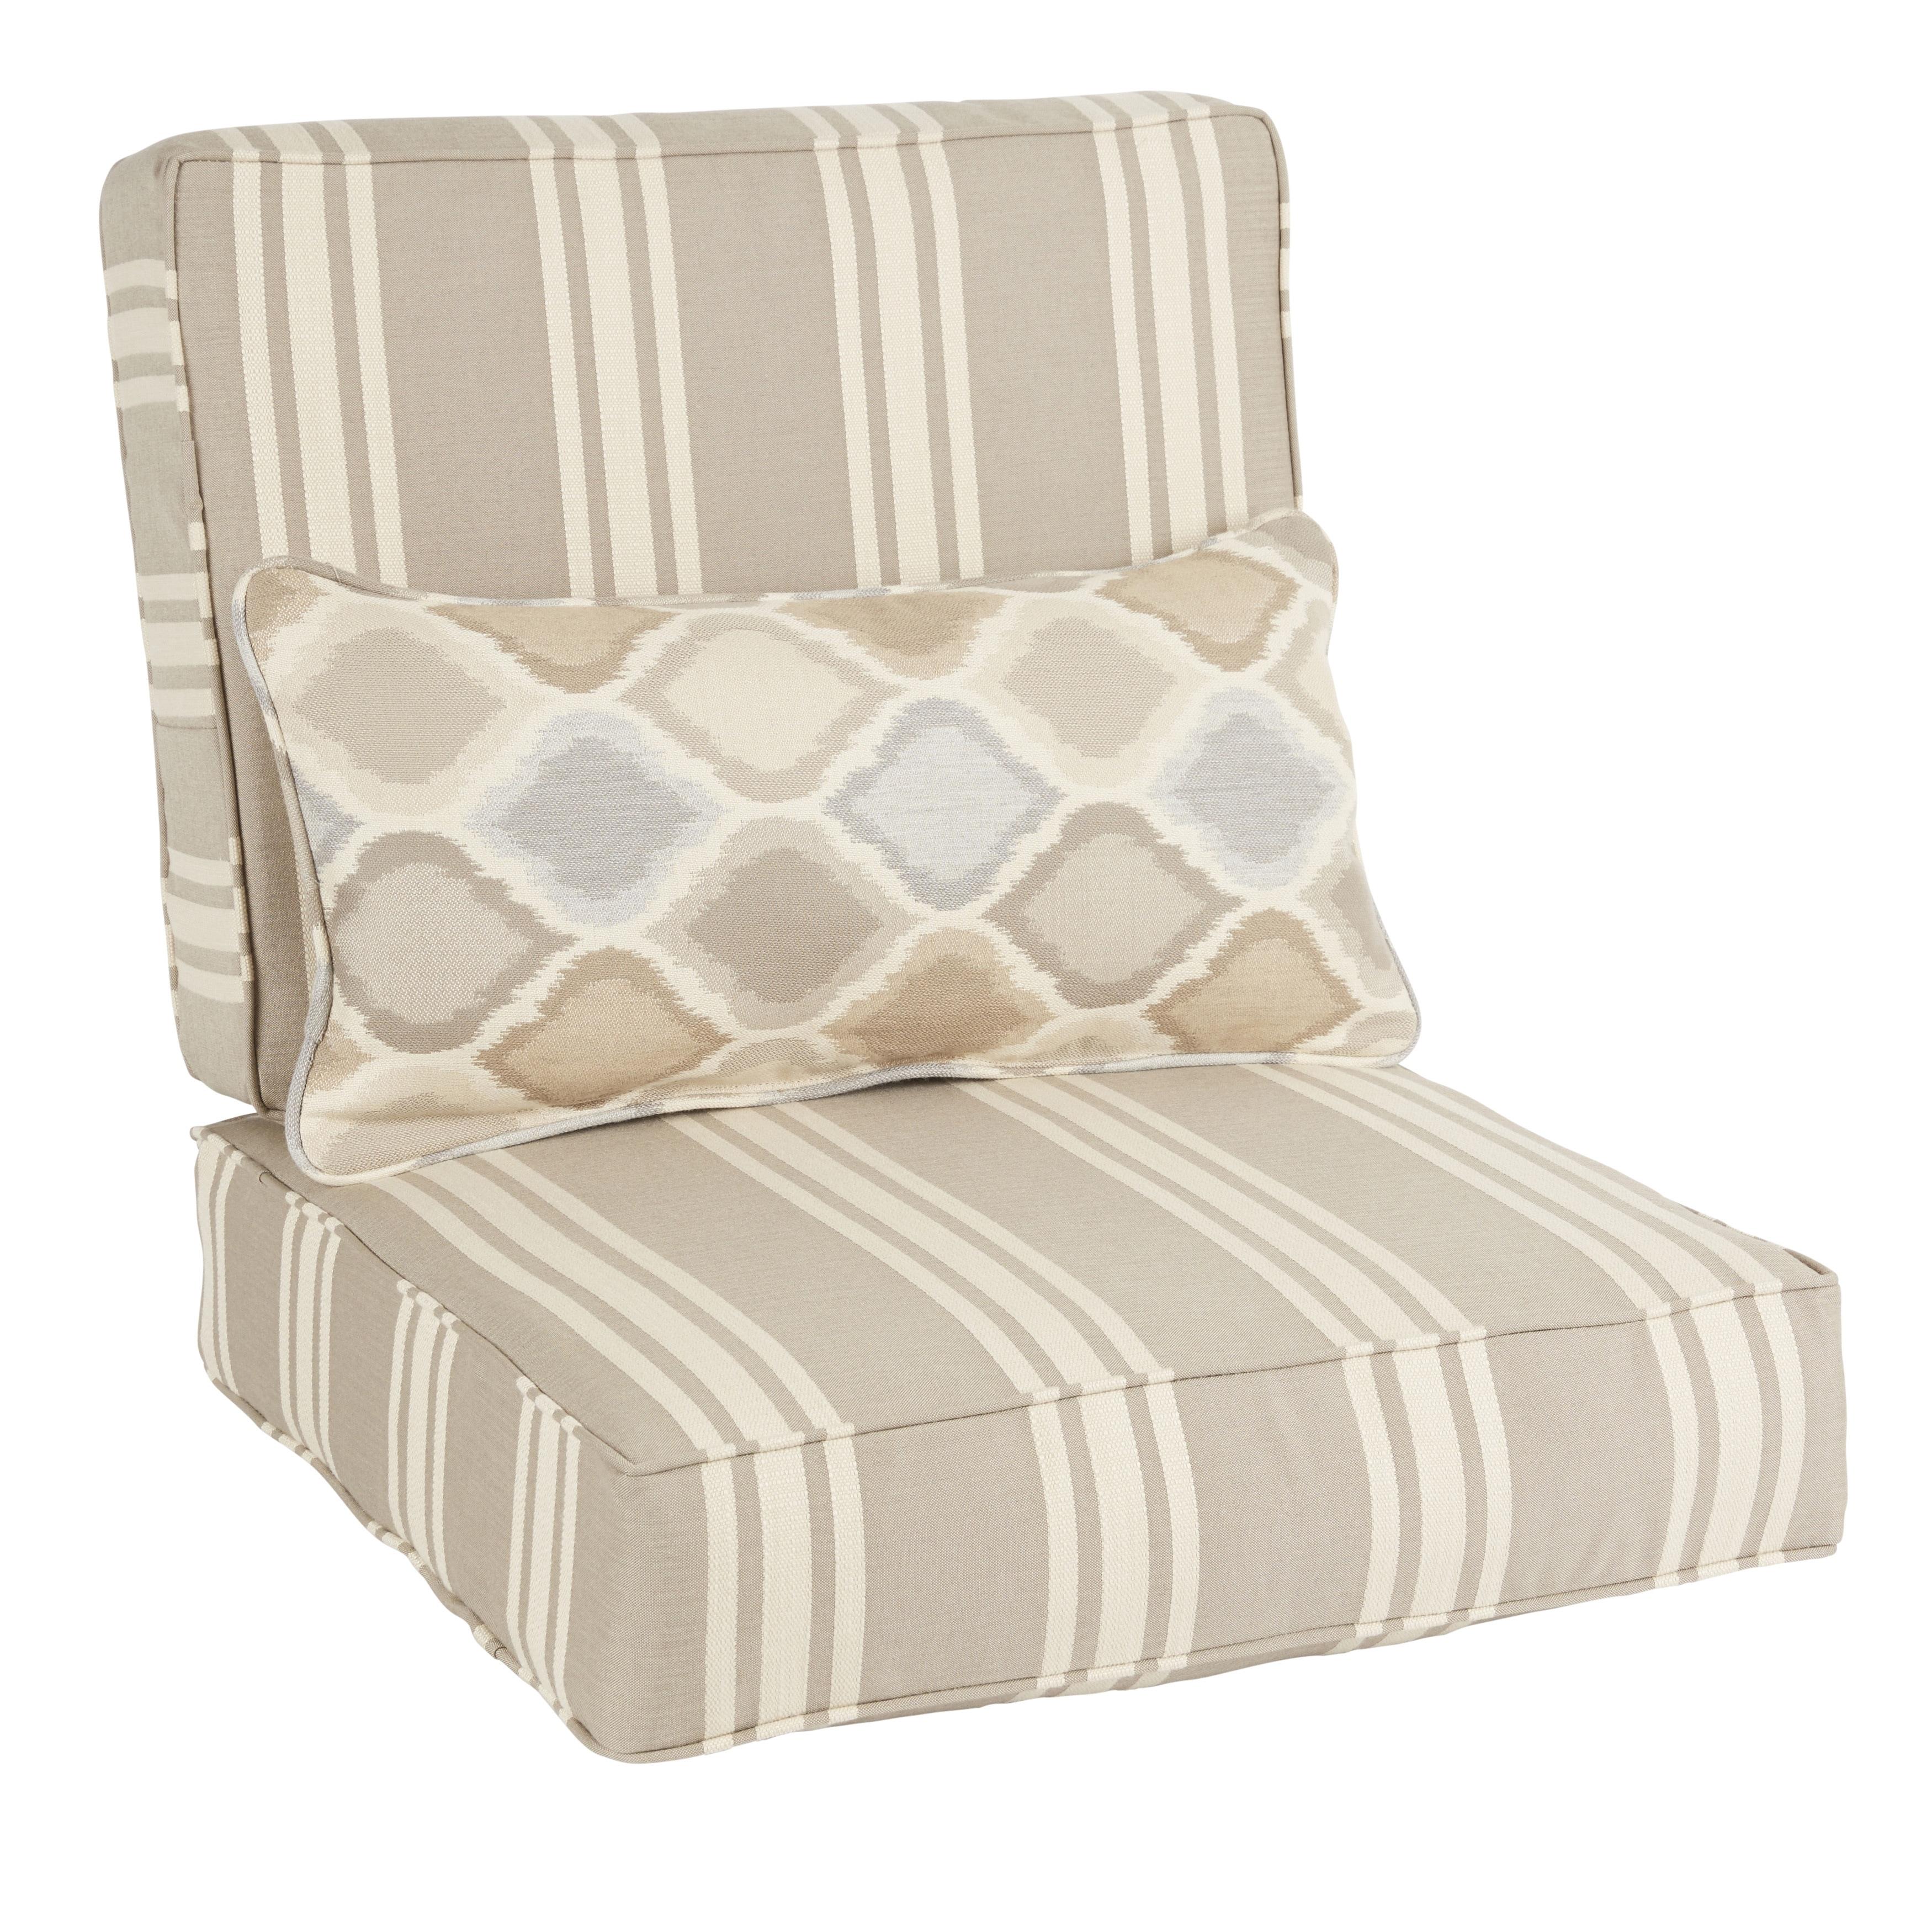 Humble + Haute Oakley Sunbrella Striped Indoor Outdoor Corded Chair